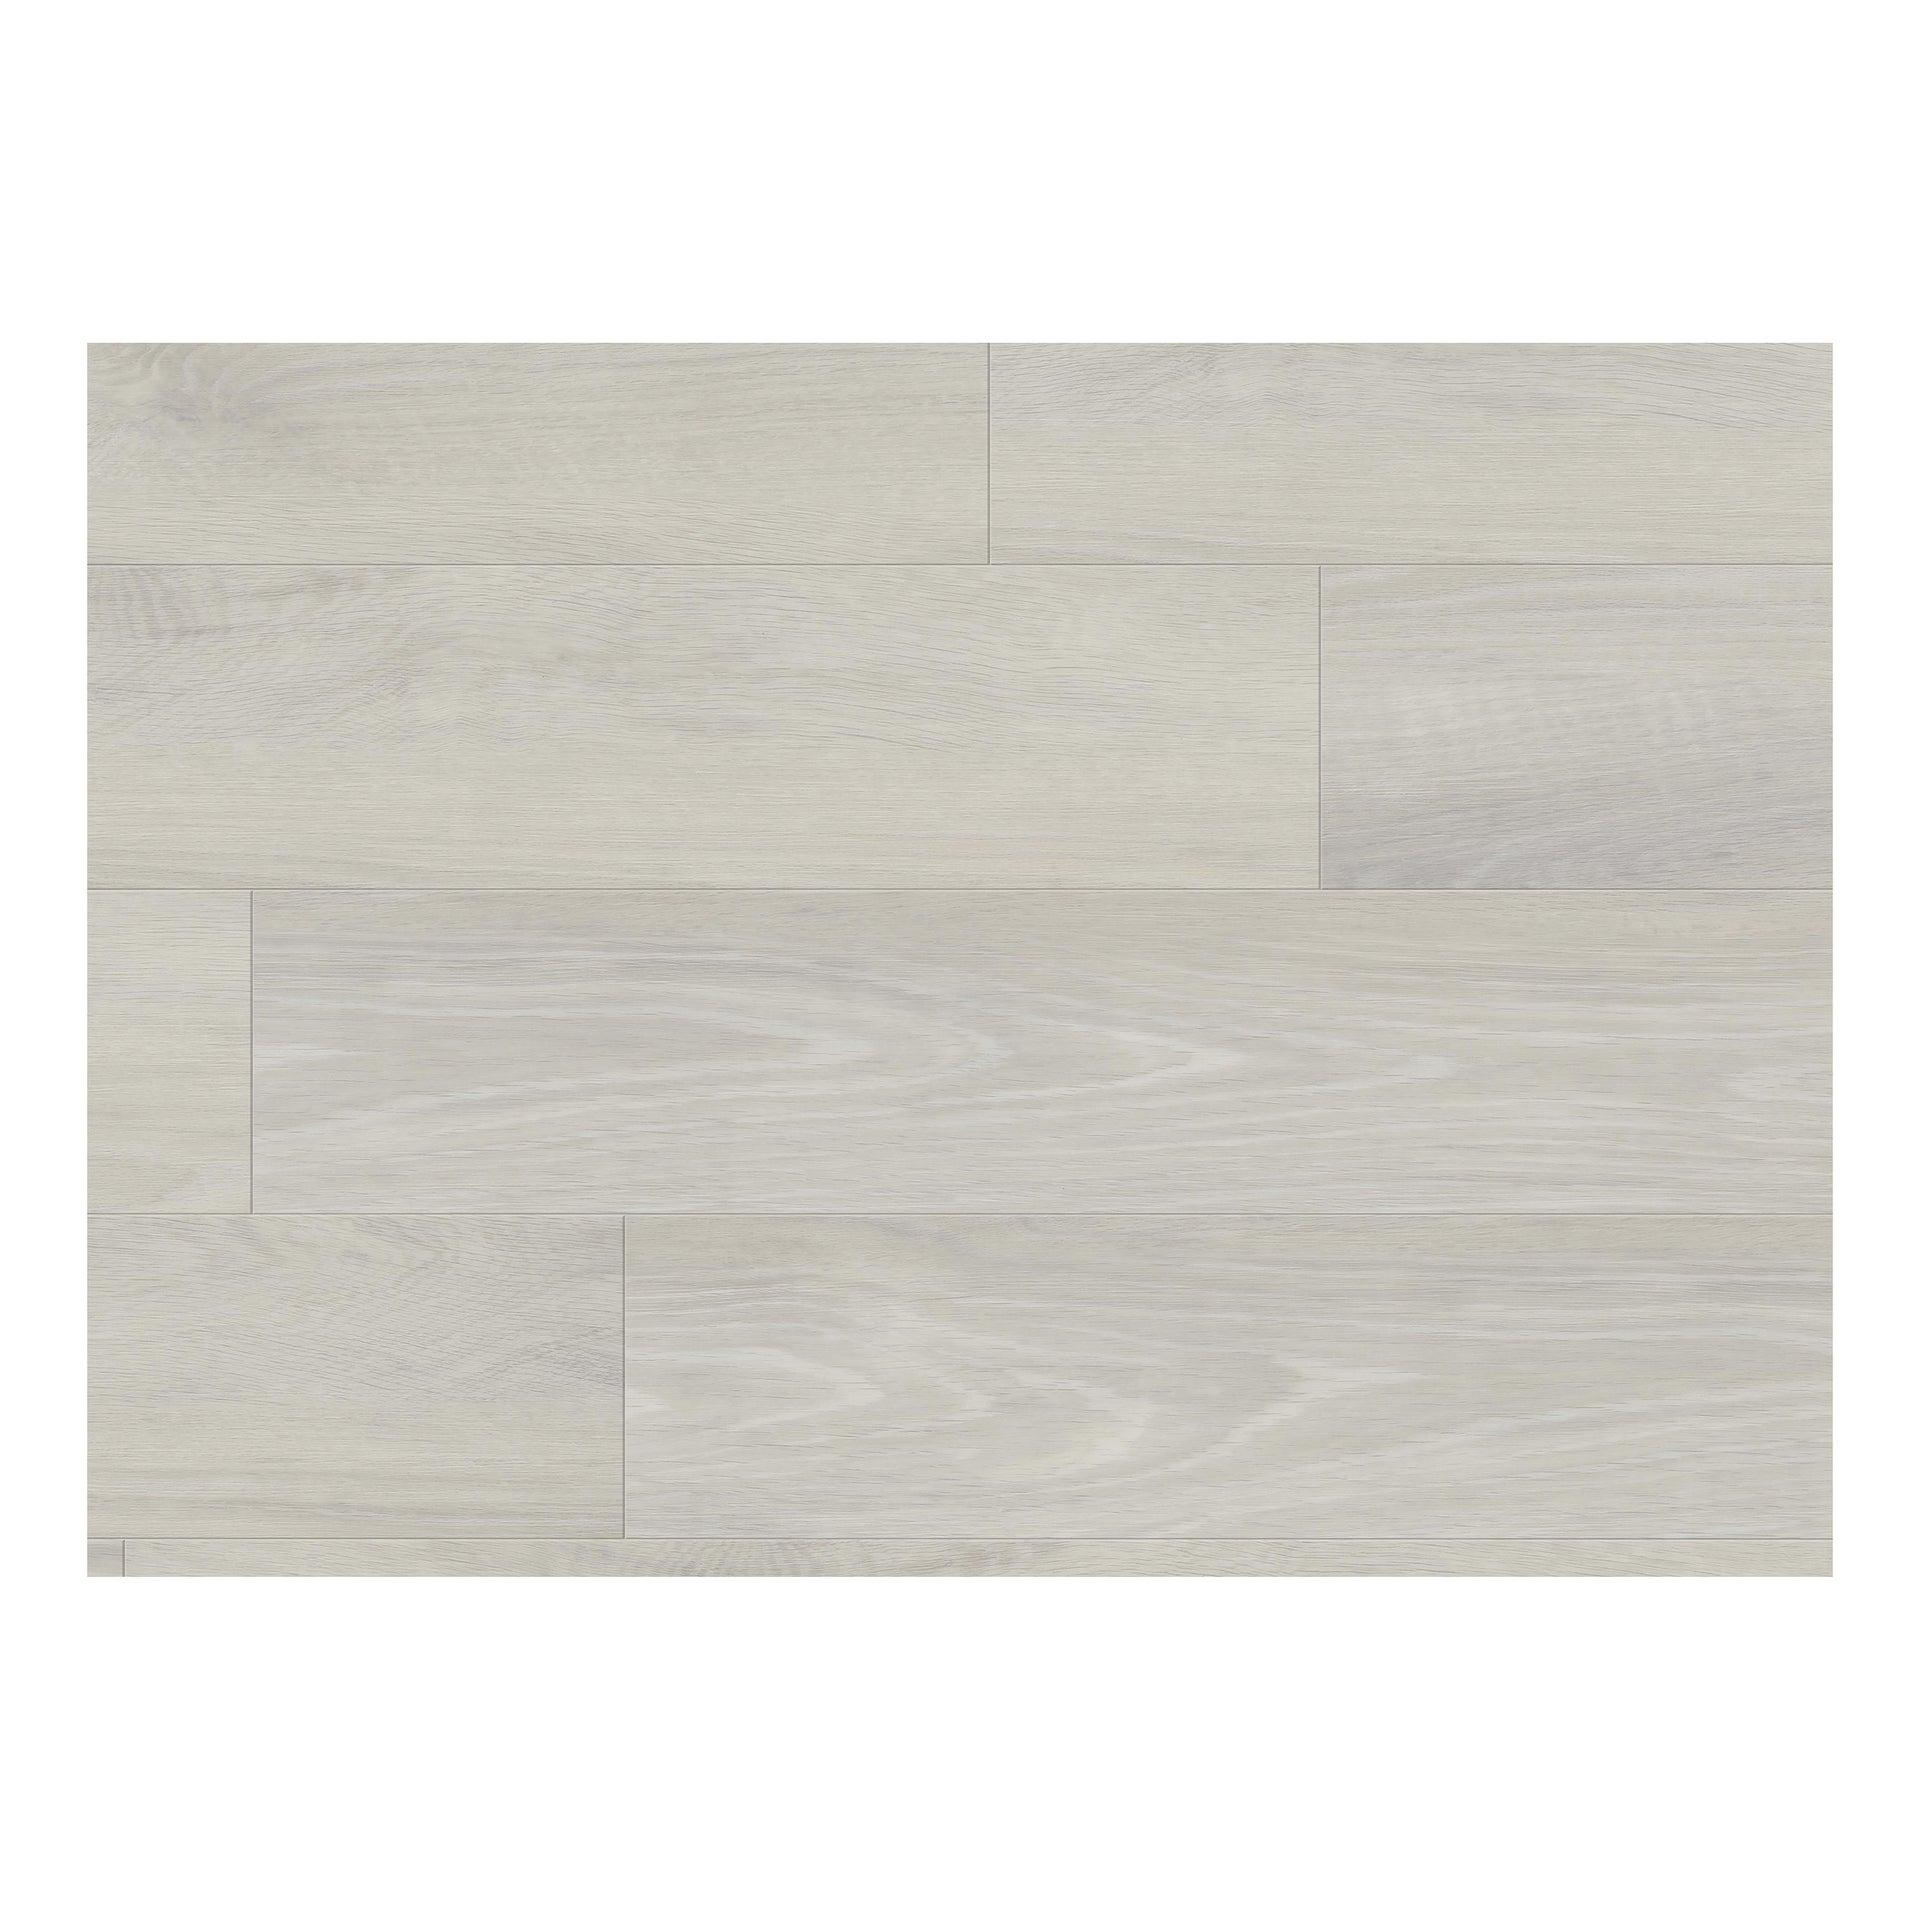 Pavimento PVC adesivo Senso Clublight Sp 2.5 mm beige - 1